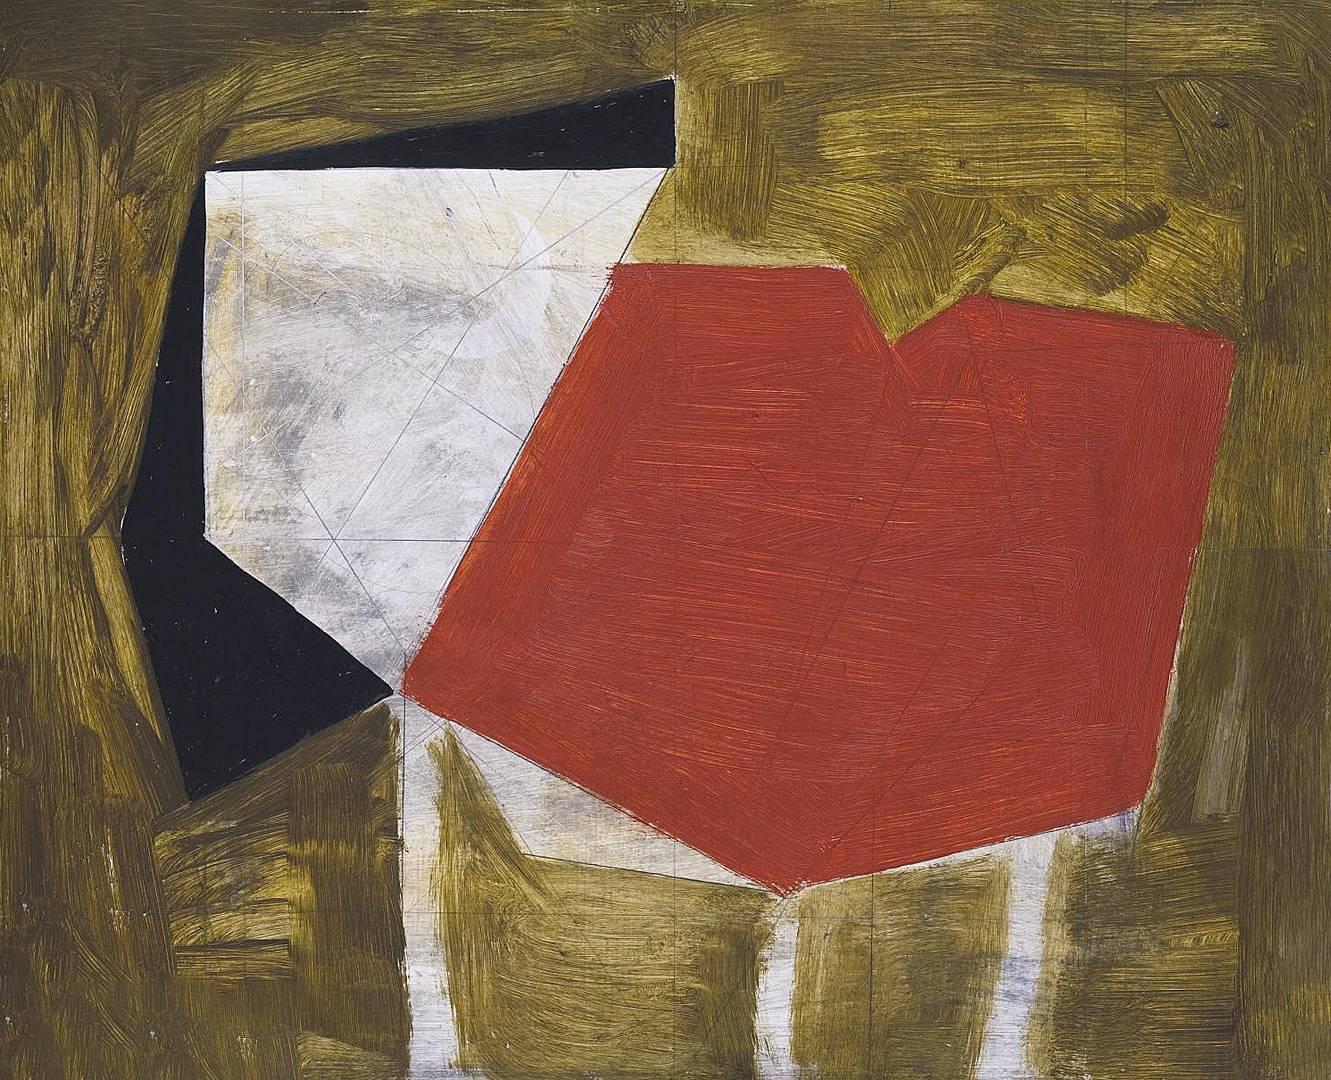 Вильгельмина Барнс-Грэм. Красная форма. 1954